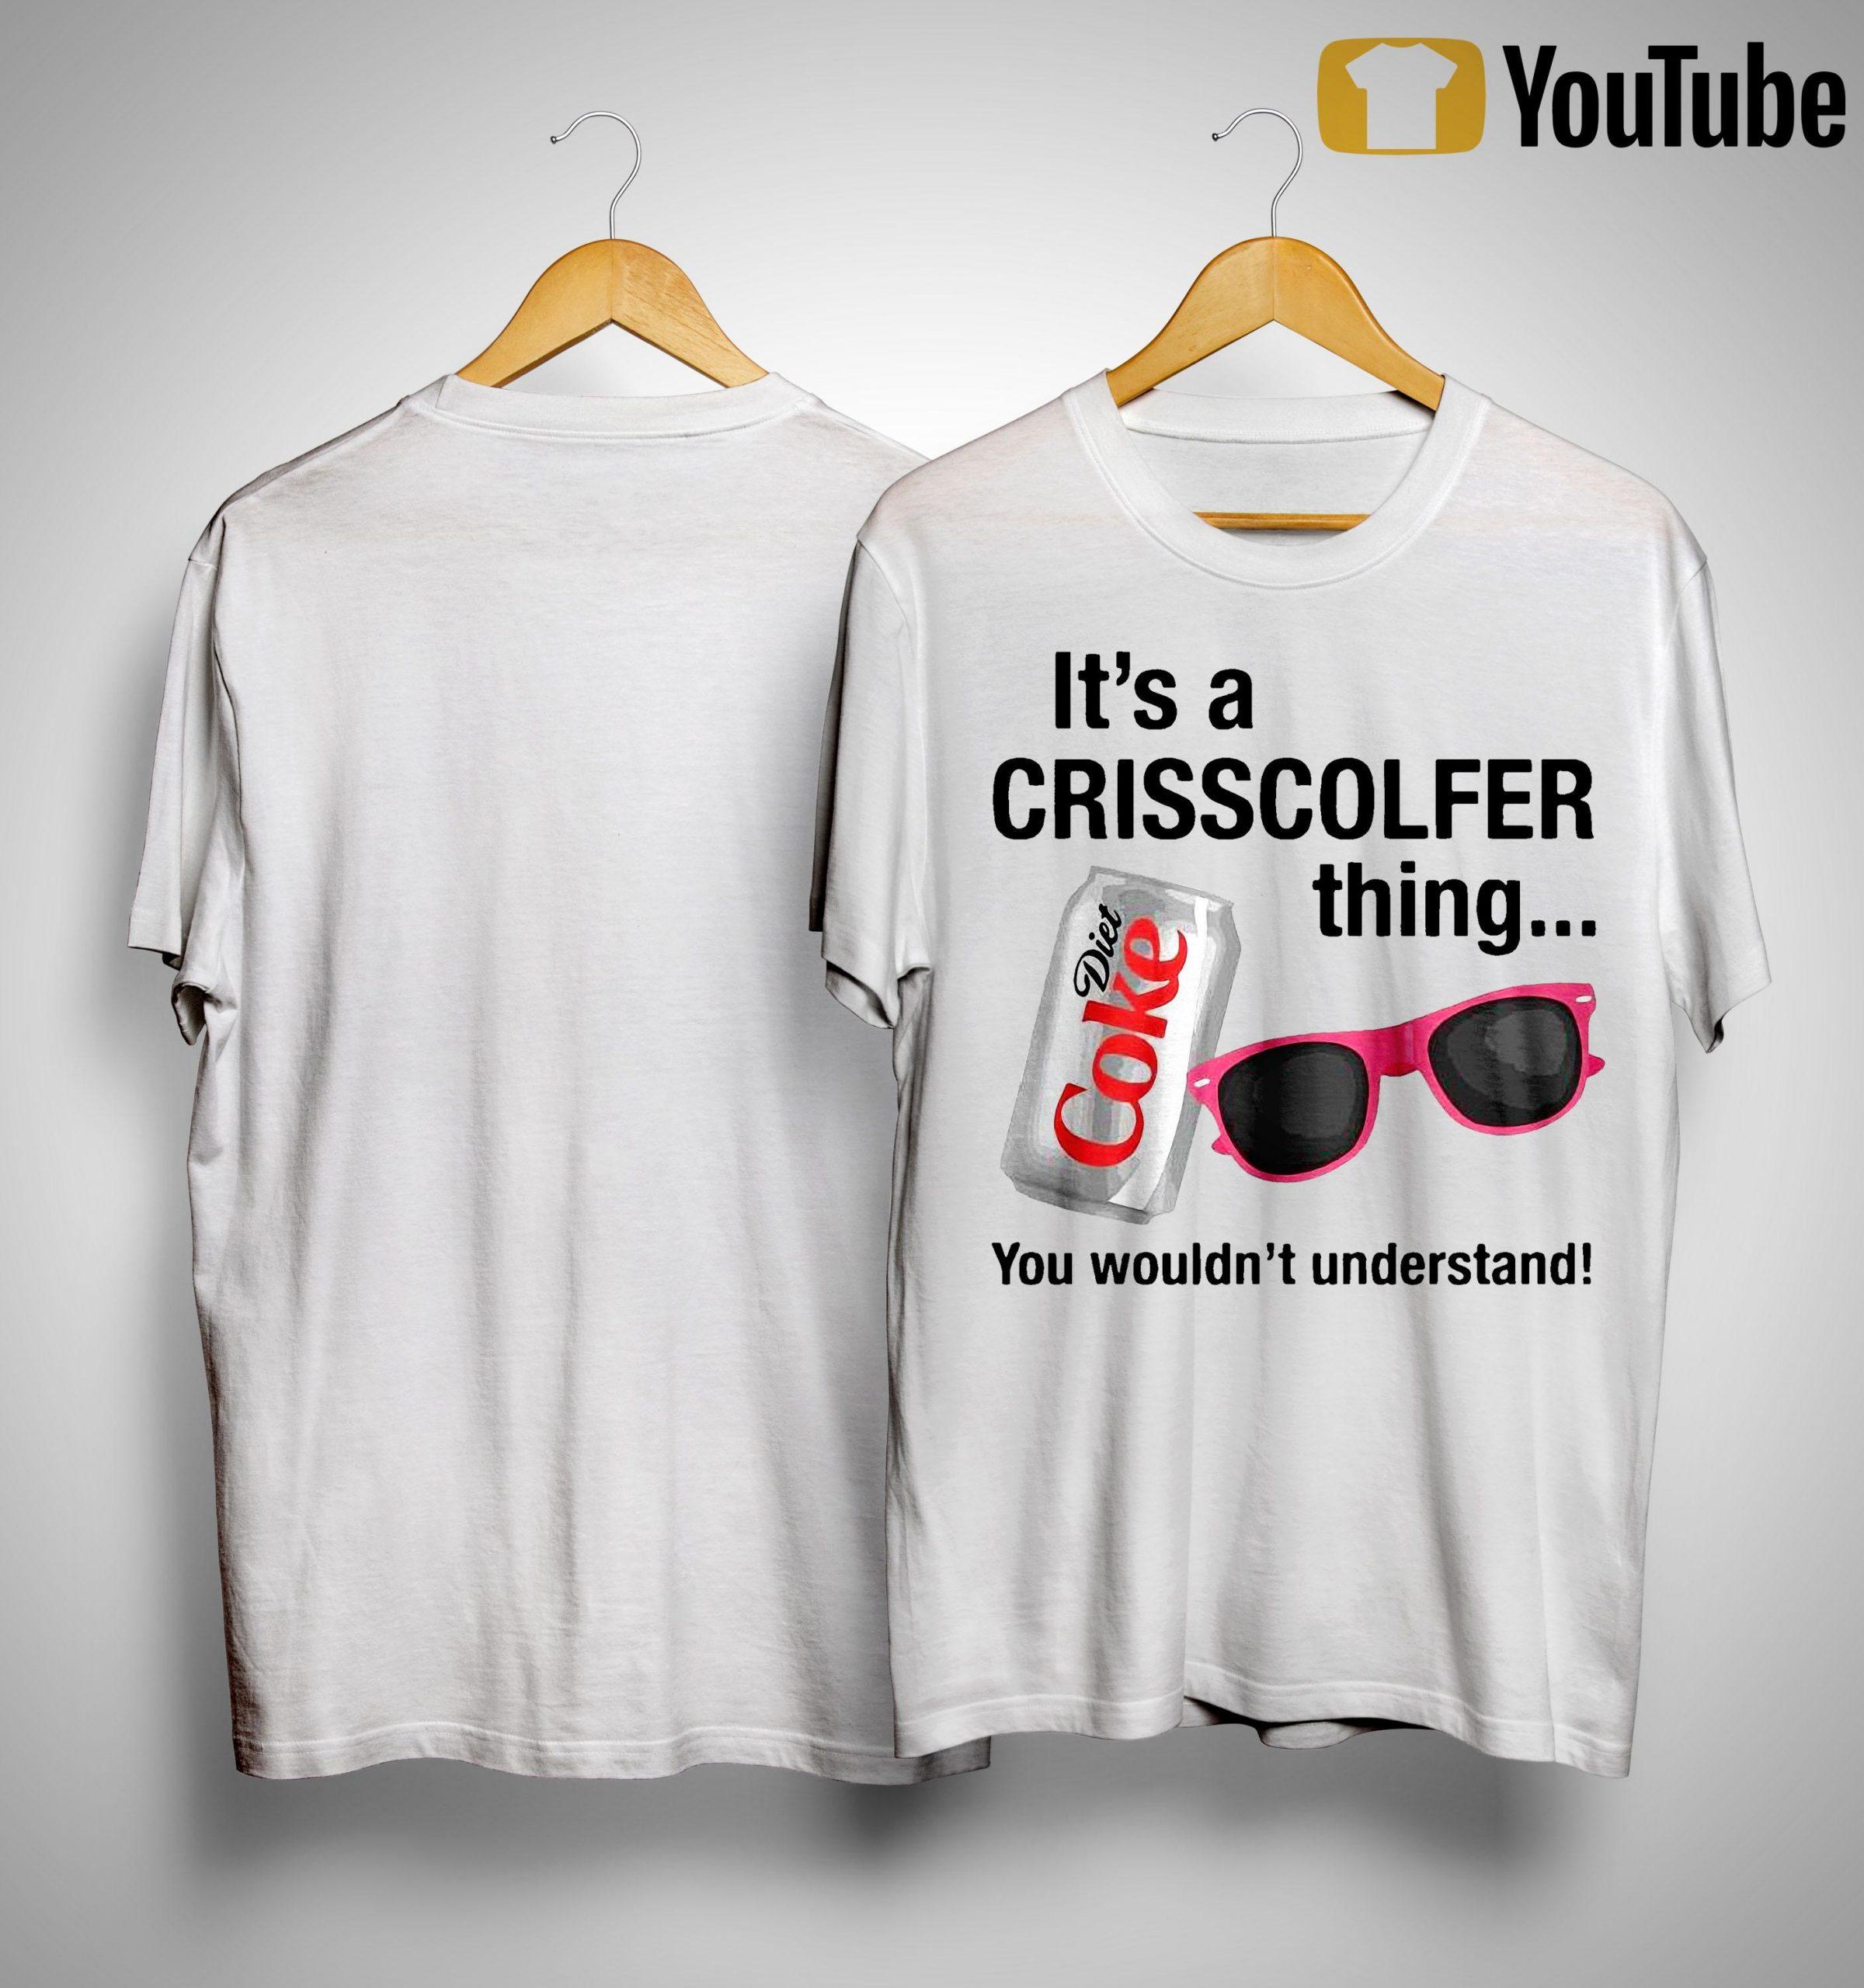 Diet Coke It's A Crisscolfer Thing You Wouldn't Understand Shirt